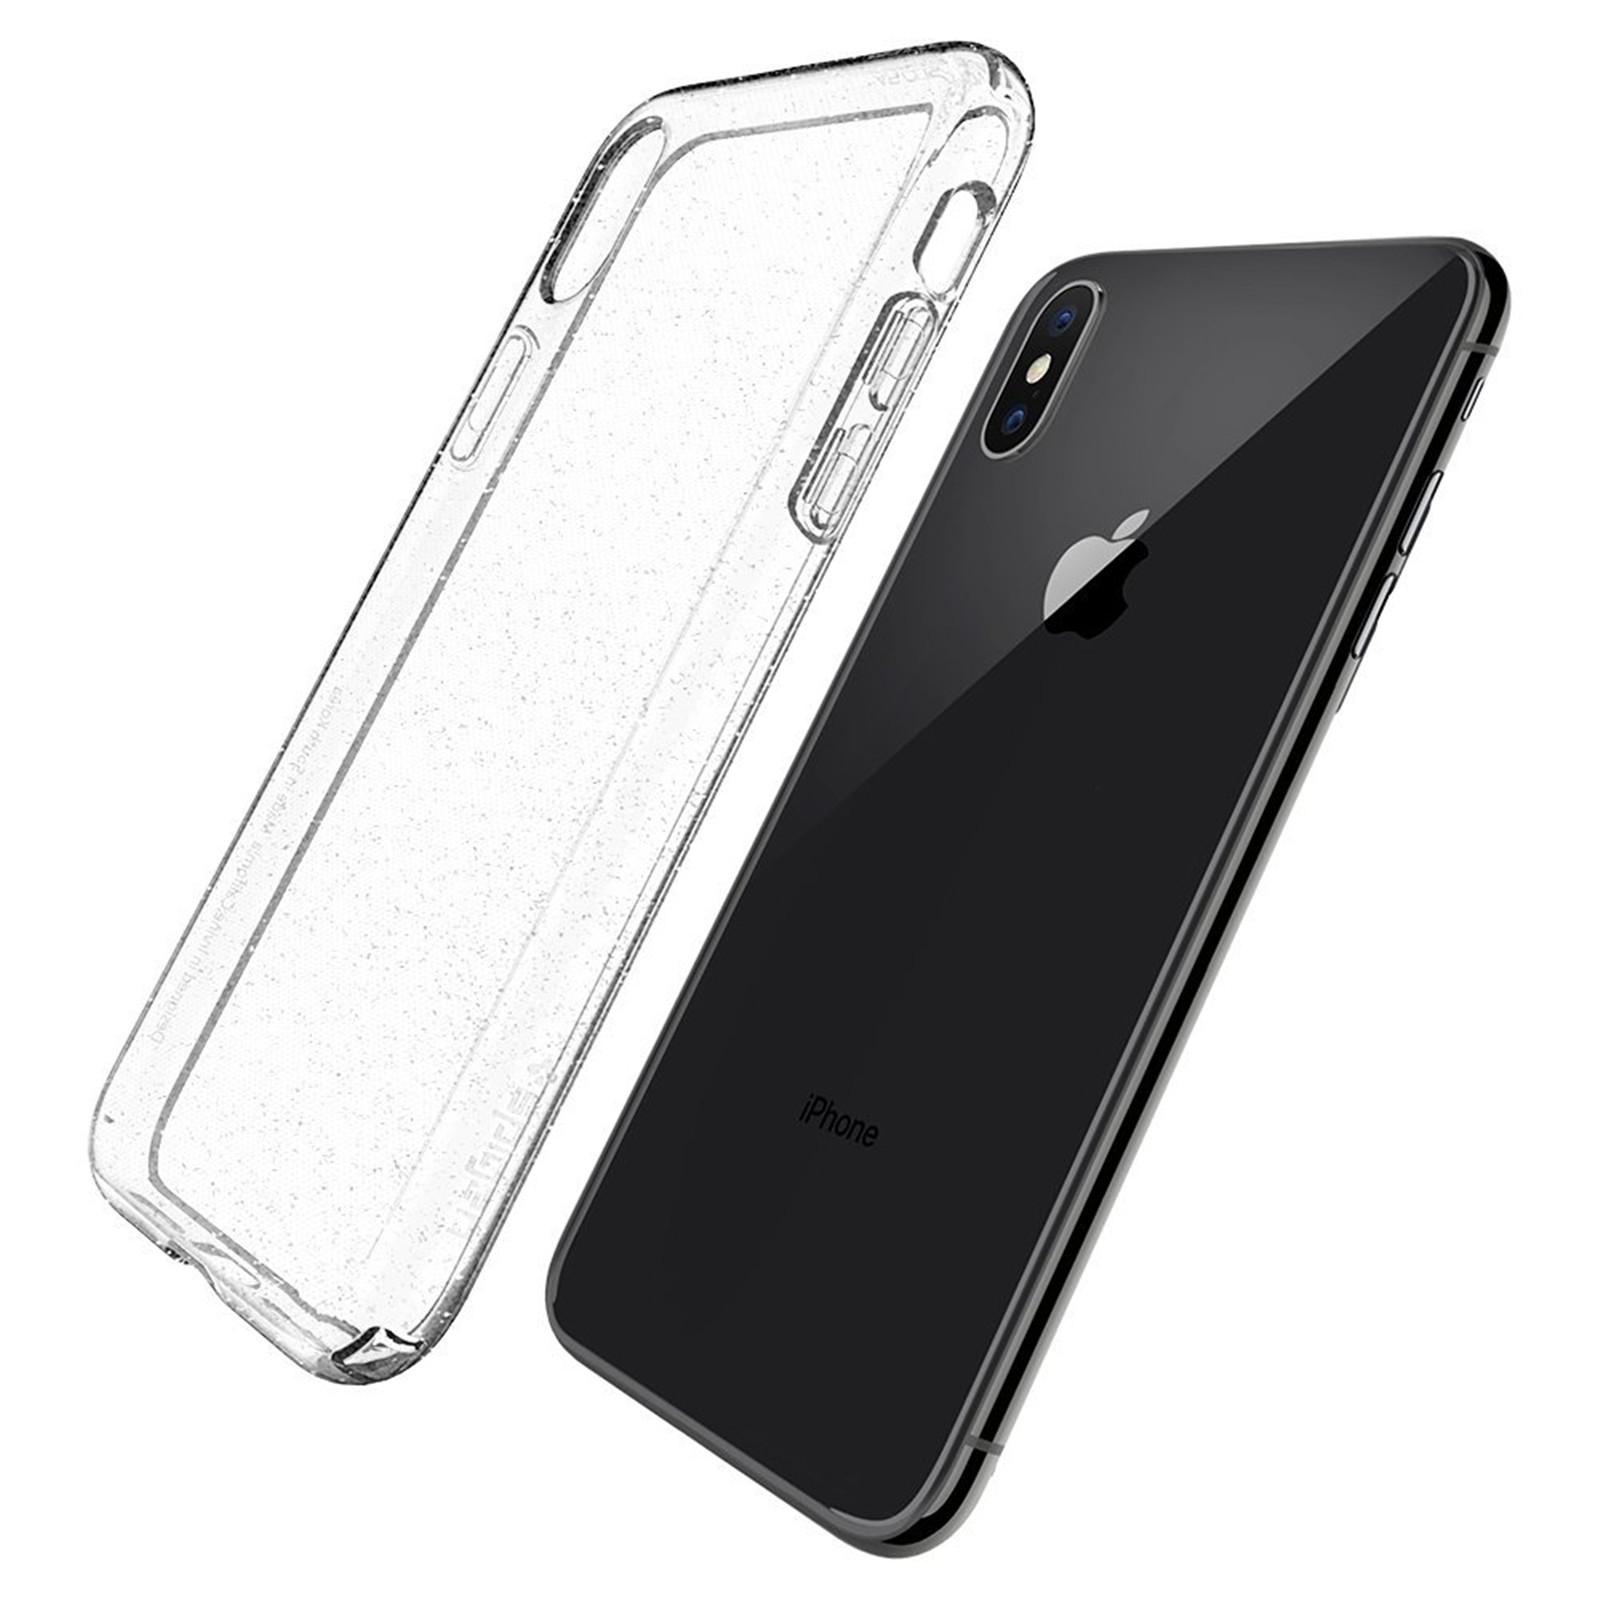 huge selection of 17aef 0998d Buy the Spigen iPhone X Liquid Crystal Case, Glitter Crystal Quartz,  ULTRA... ( 057CS22122 ) online